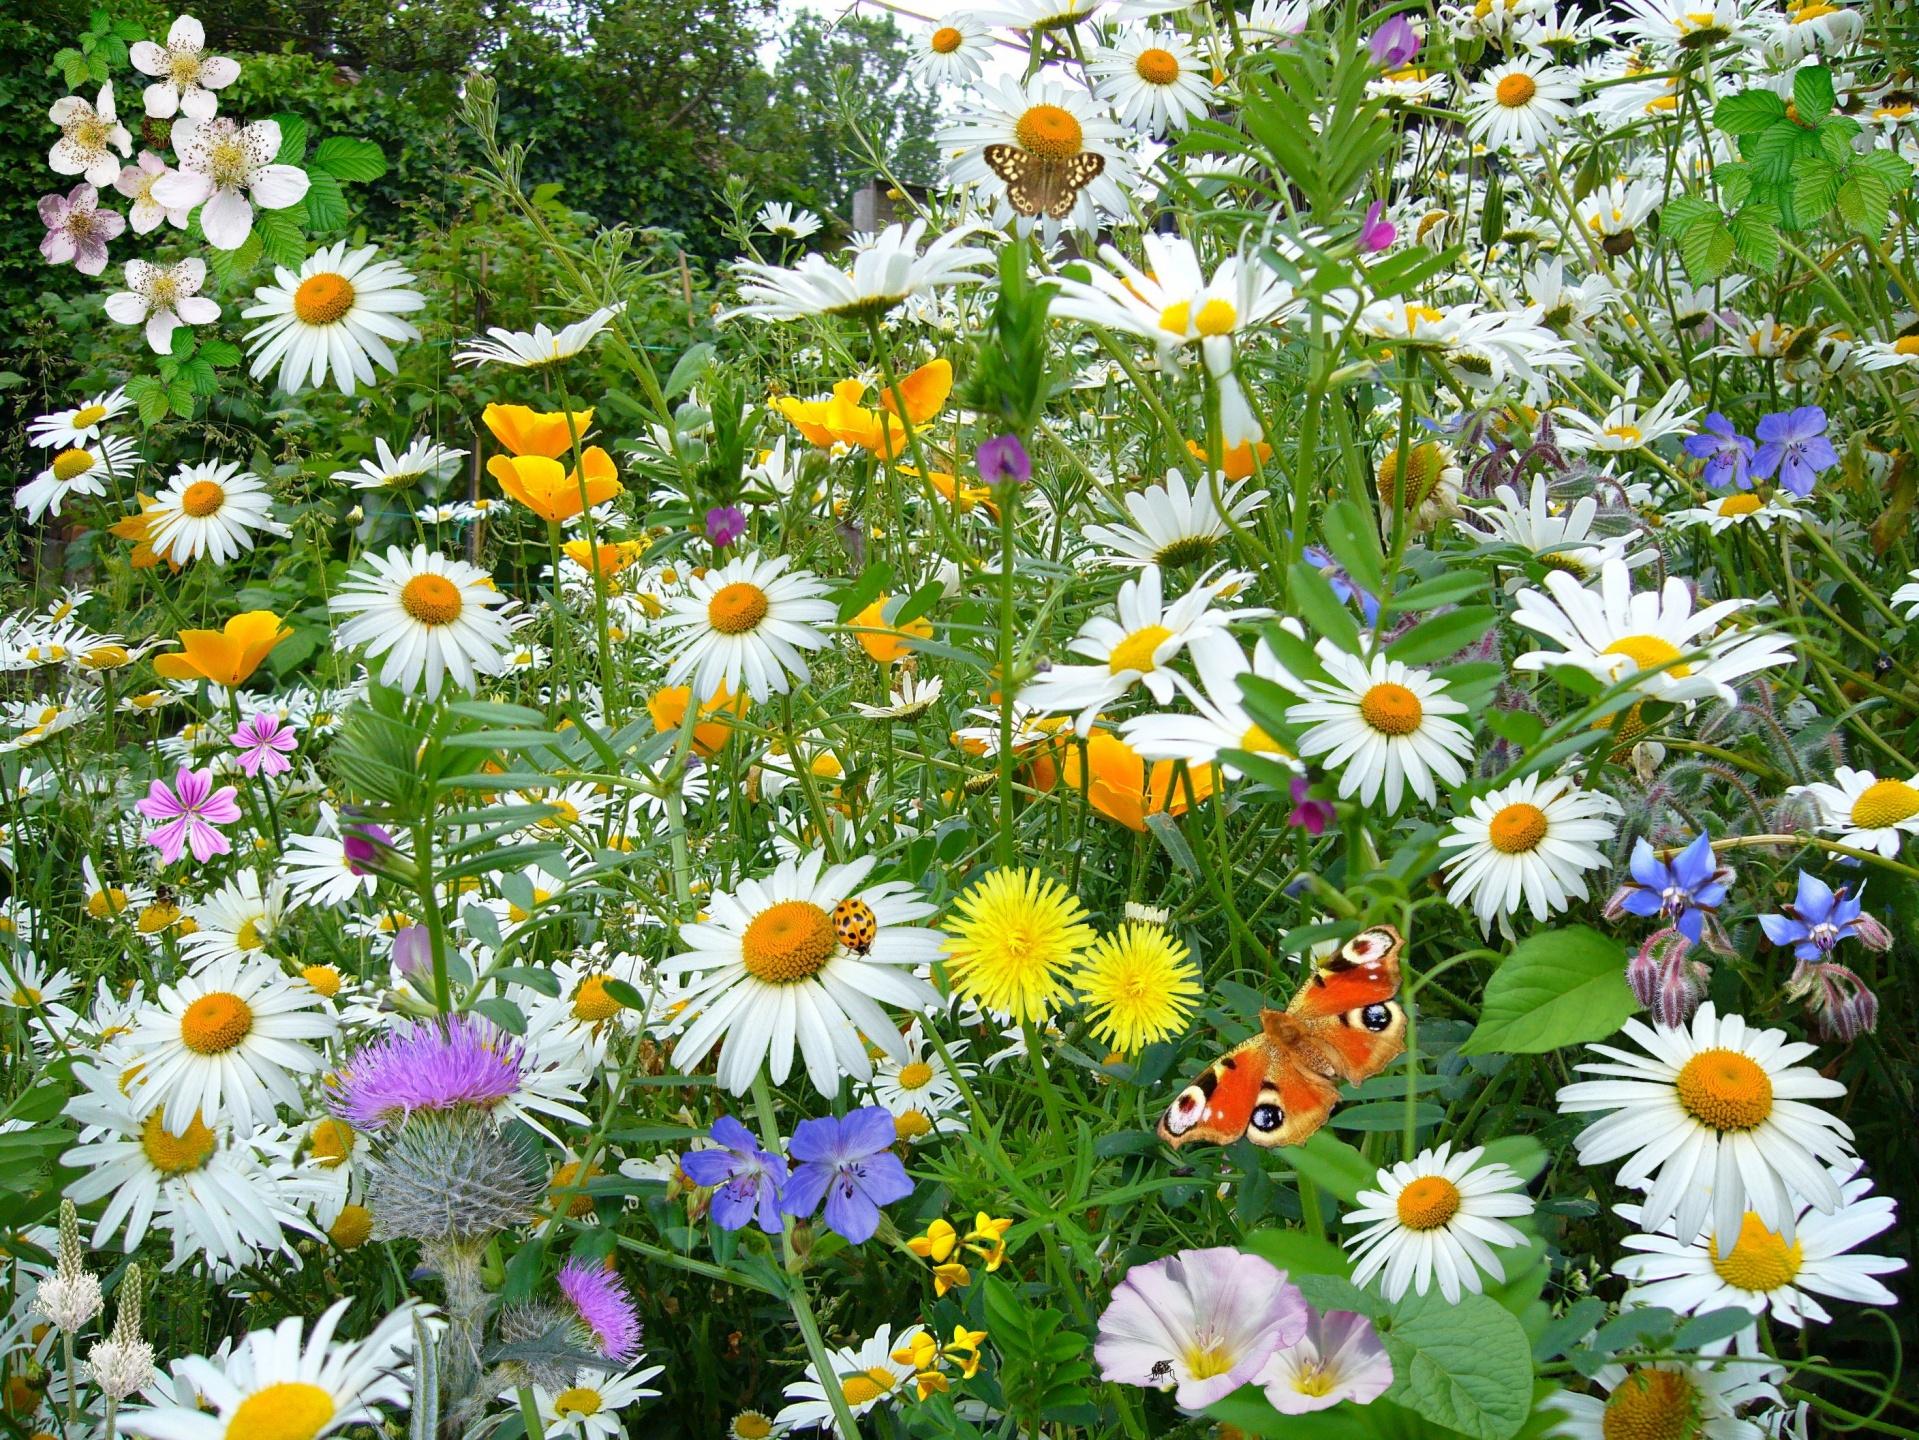 Nature, Flowers, Wild Flowers